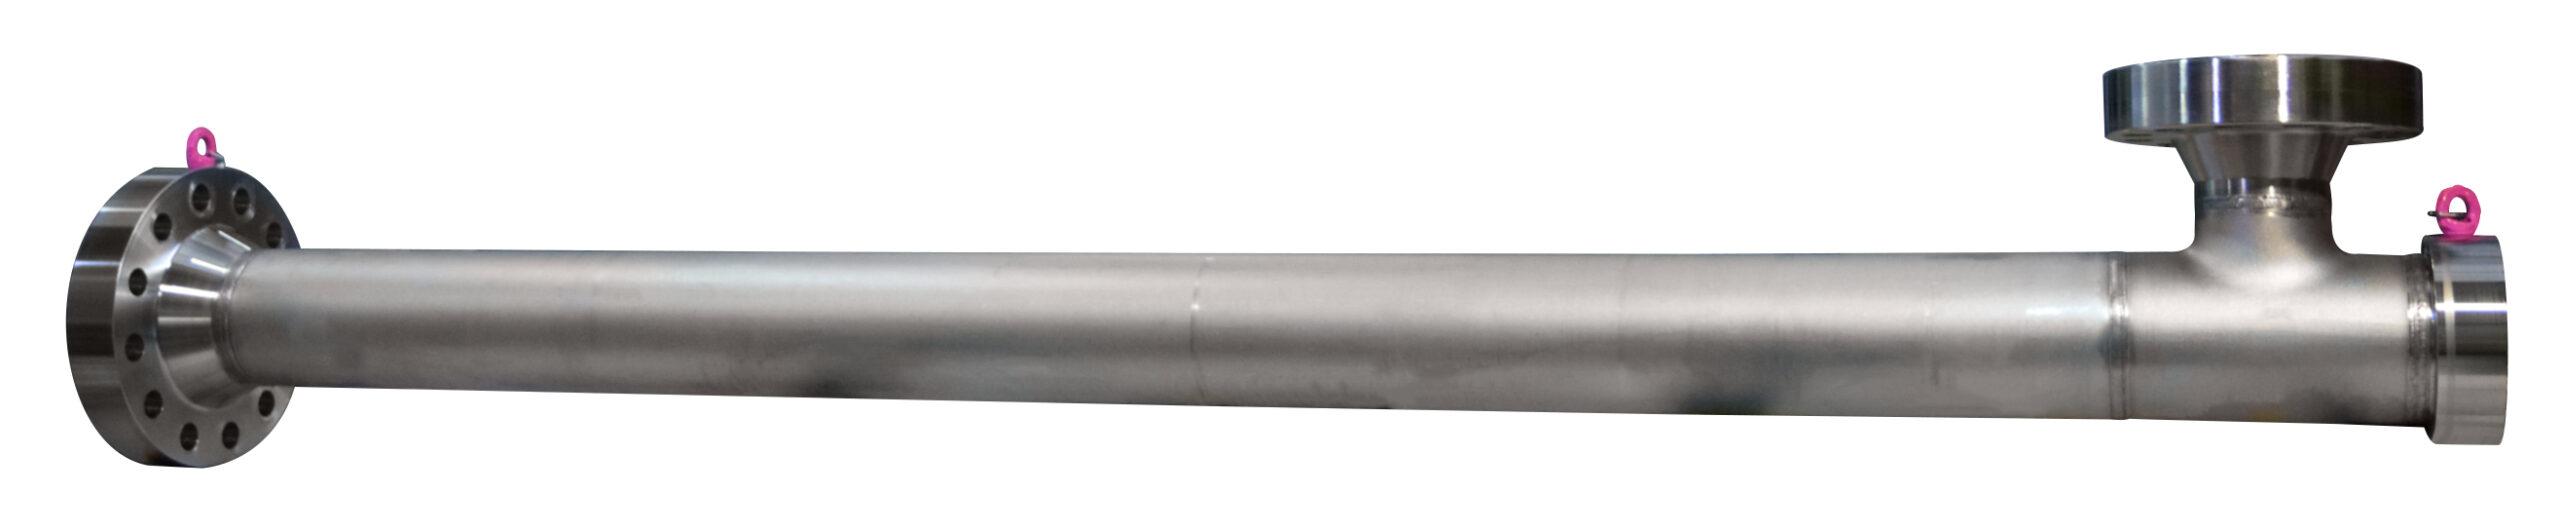 Transvac size 8 Liquid Jet Compressor for Aramco Materials: Duplex (UNS S31803) with Ceramic Internals